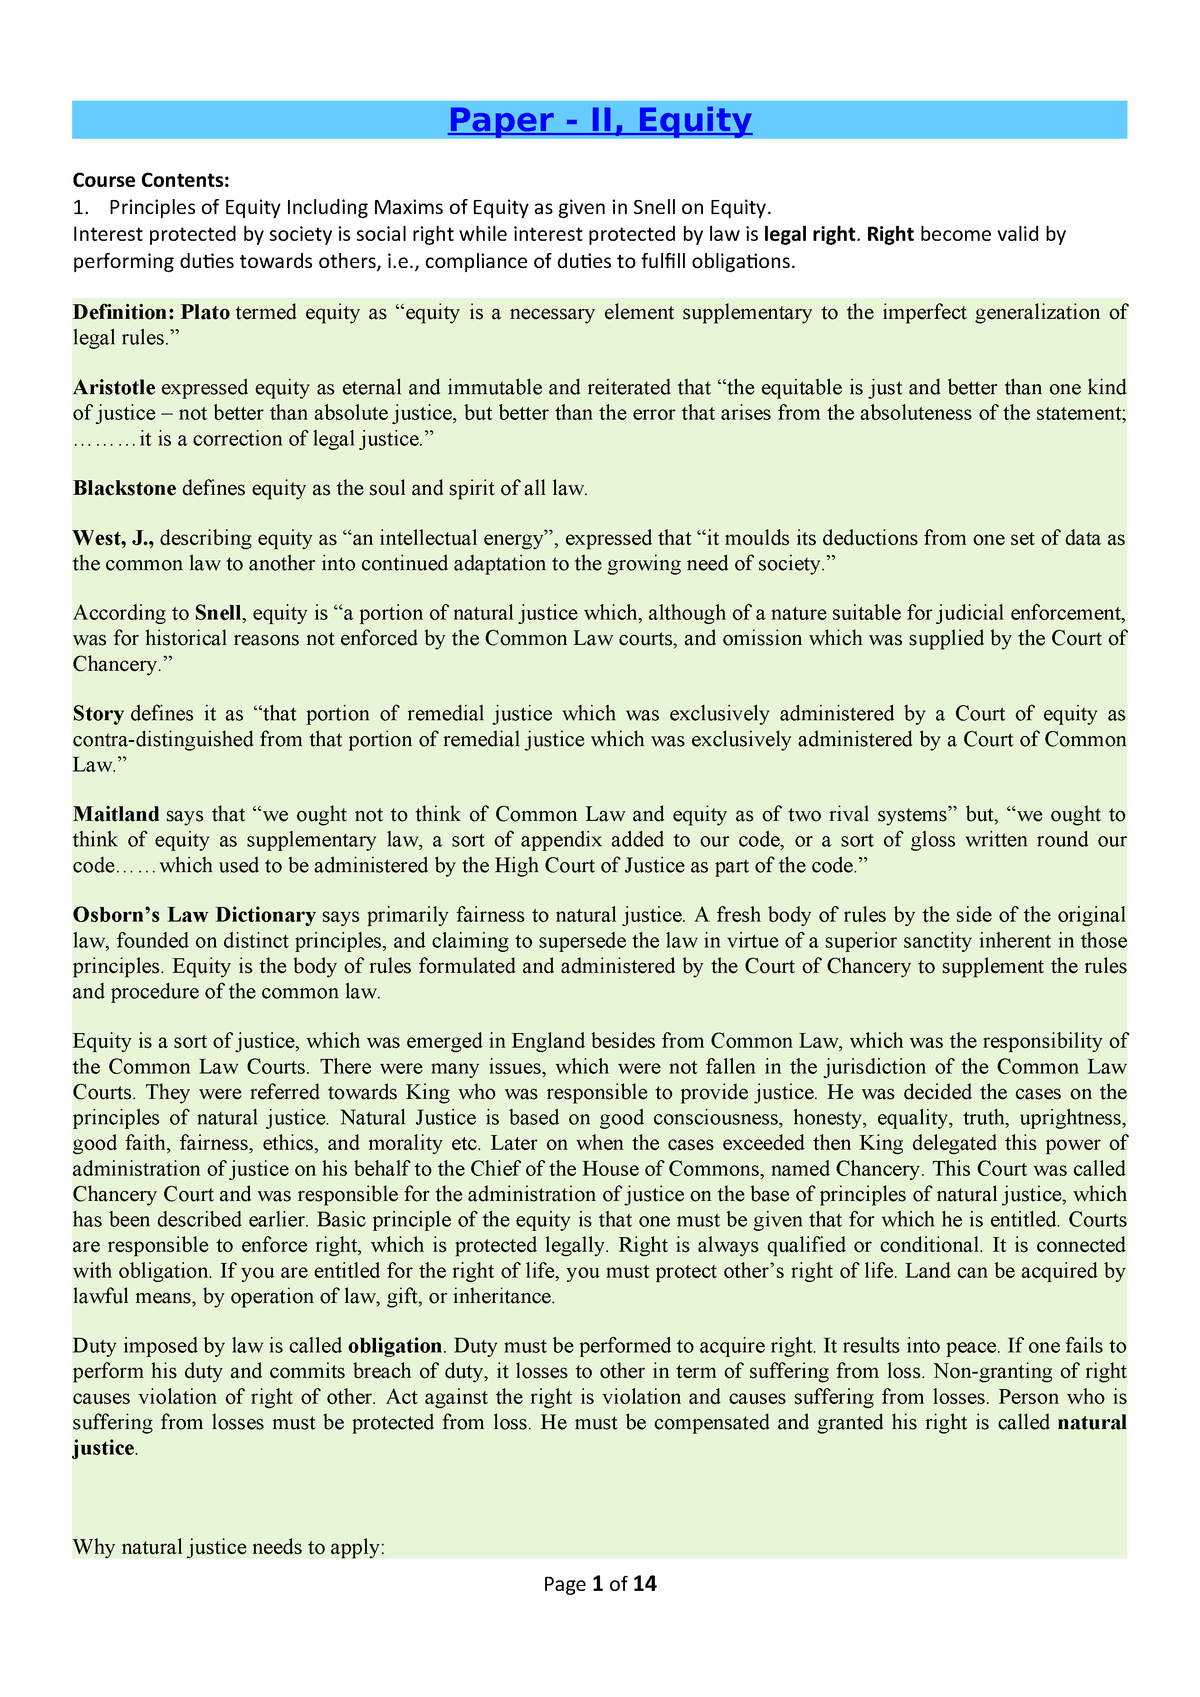 Equity LLB  PART 2 (II) - Lecture notes 1 - Llb 03000 - StuDocu